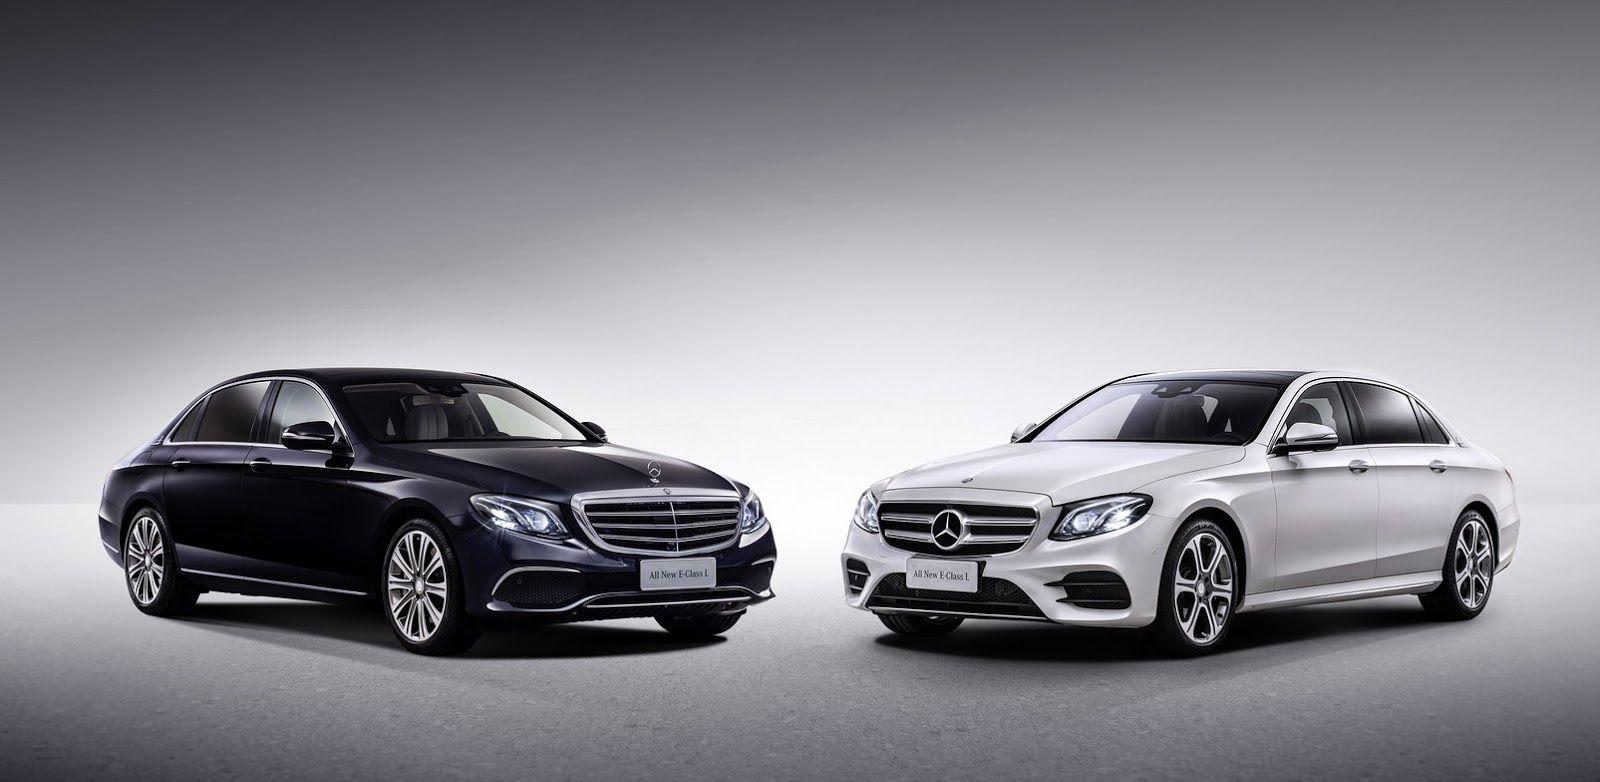 China S New Mercedes Benz E Class Lwb Looks Like A Mini Maybach